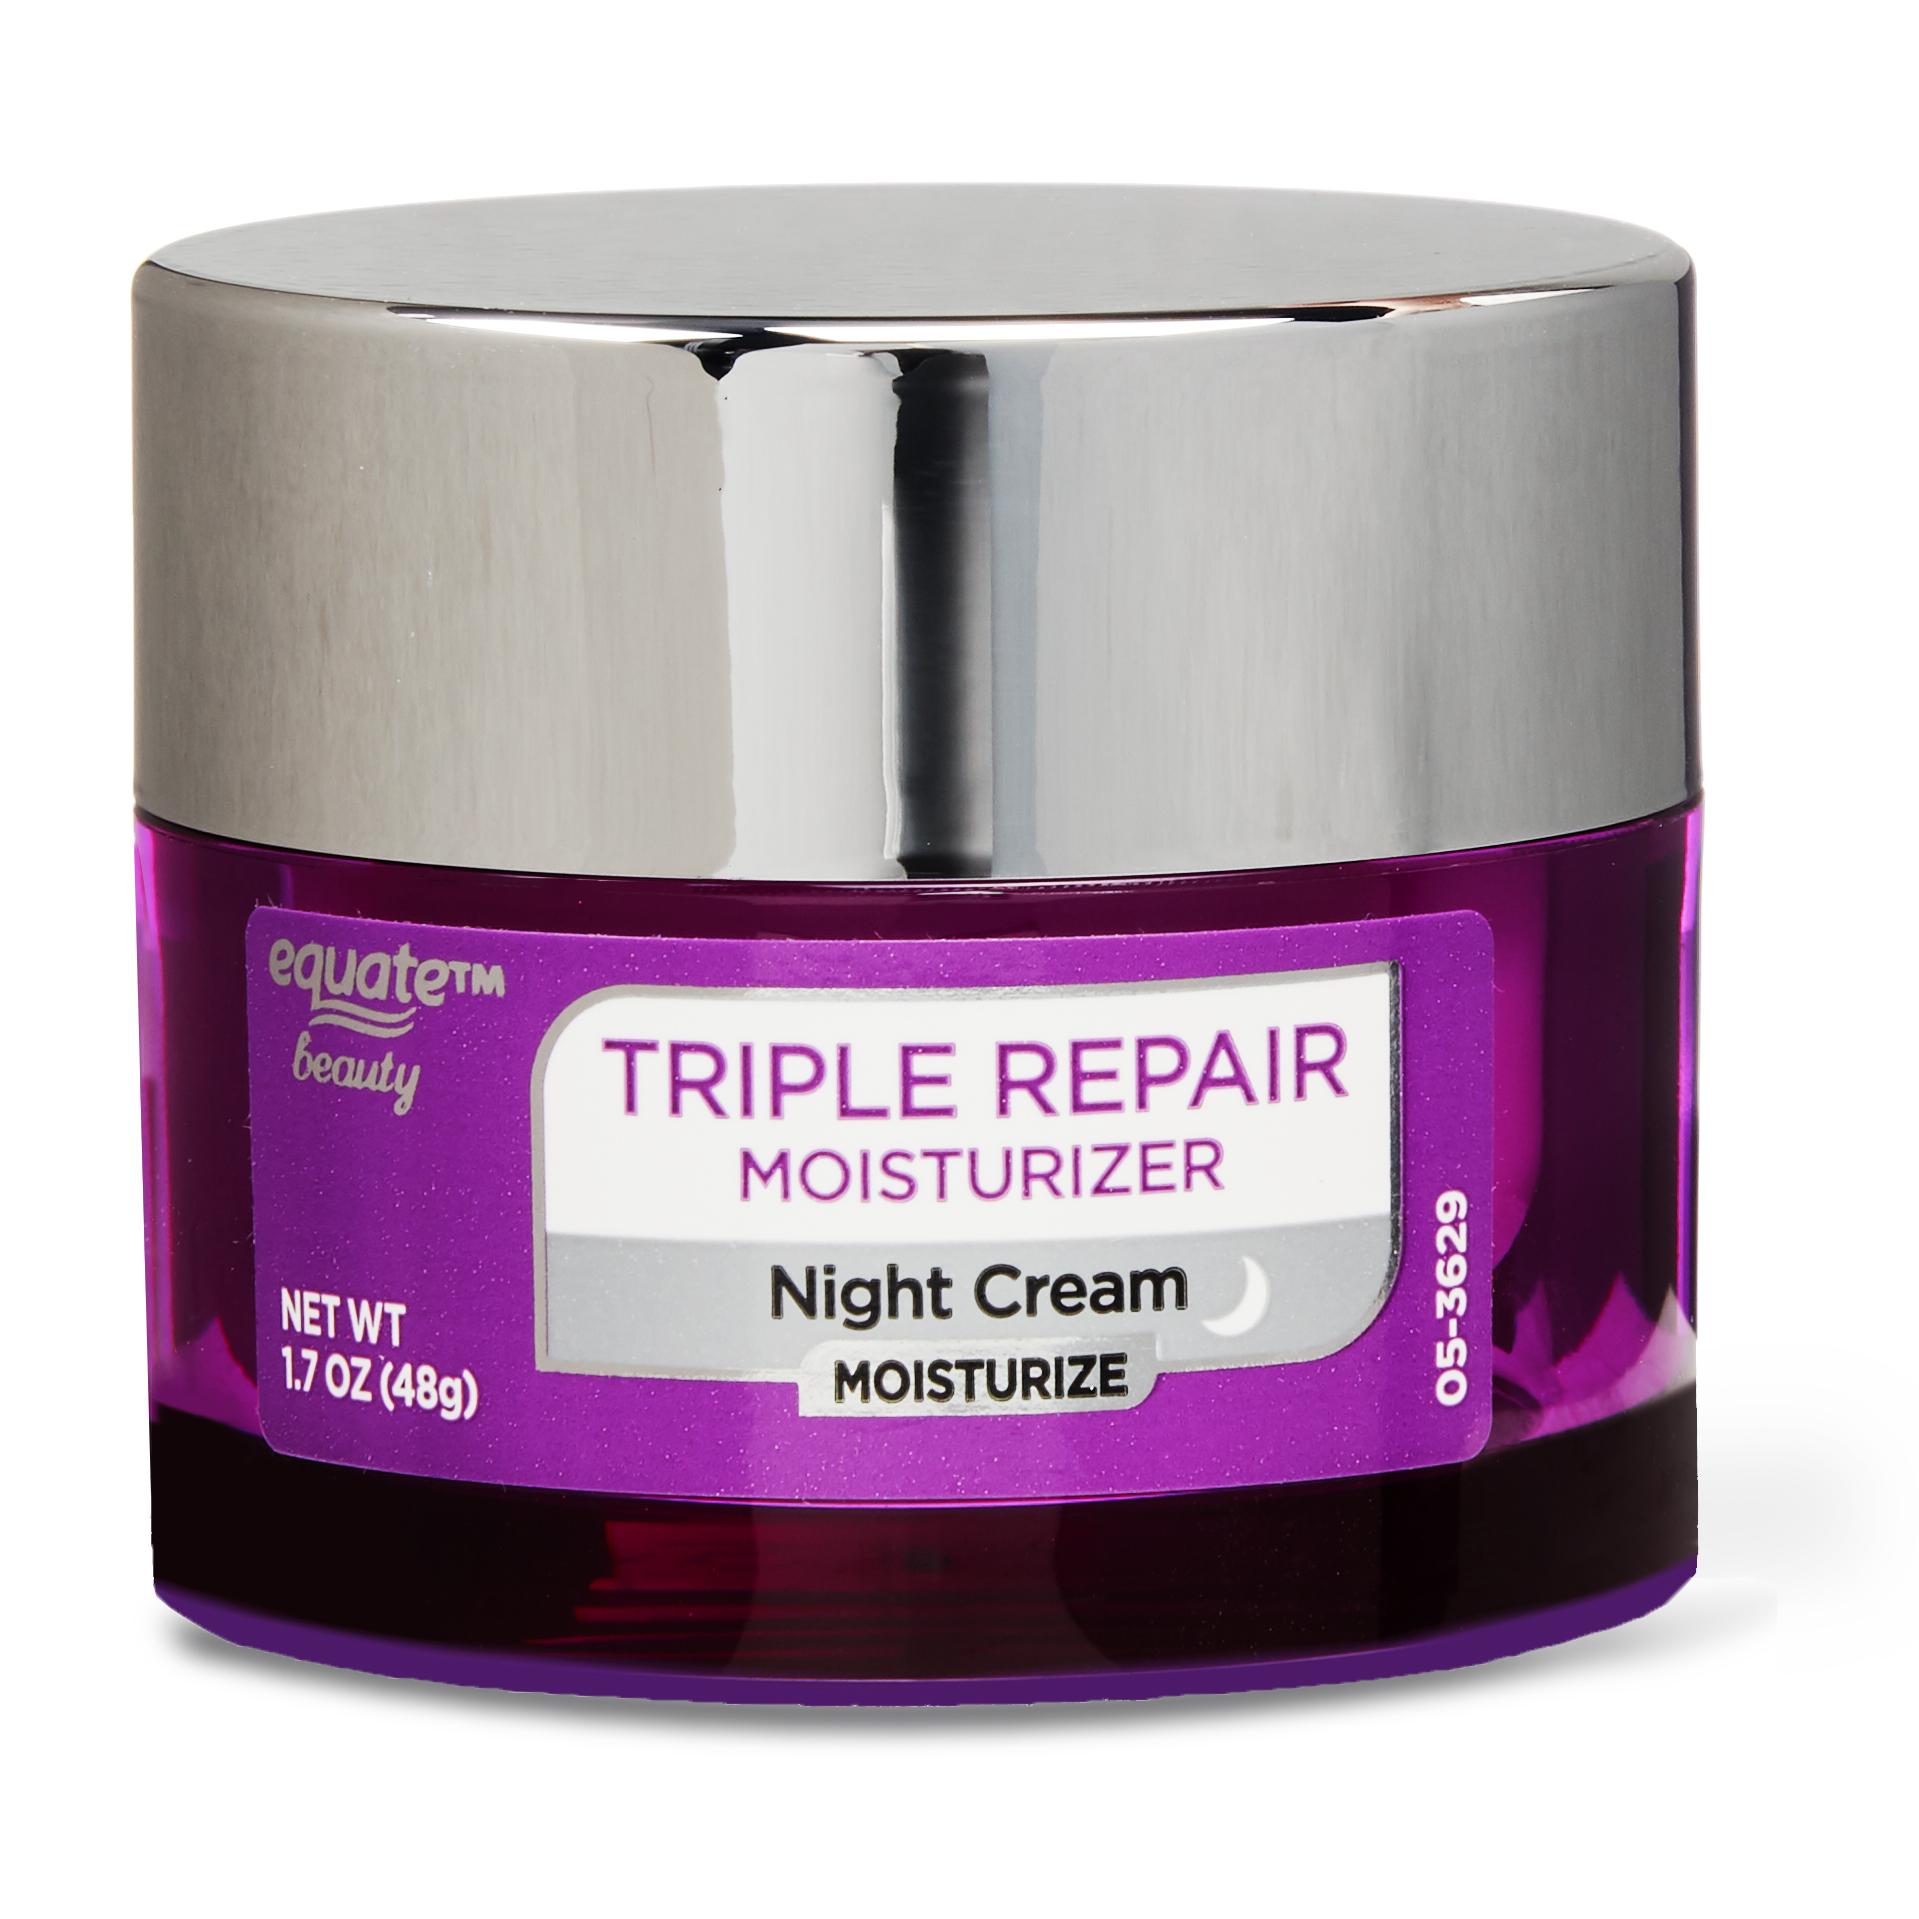 Equate Eb Triple Rep Moisturizer Night Cream